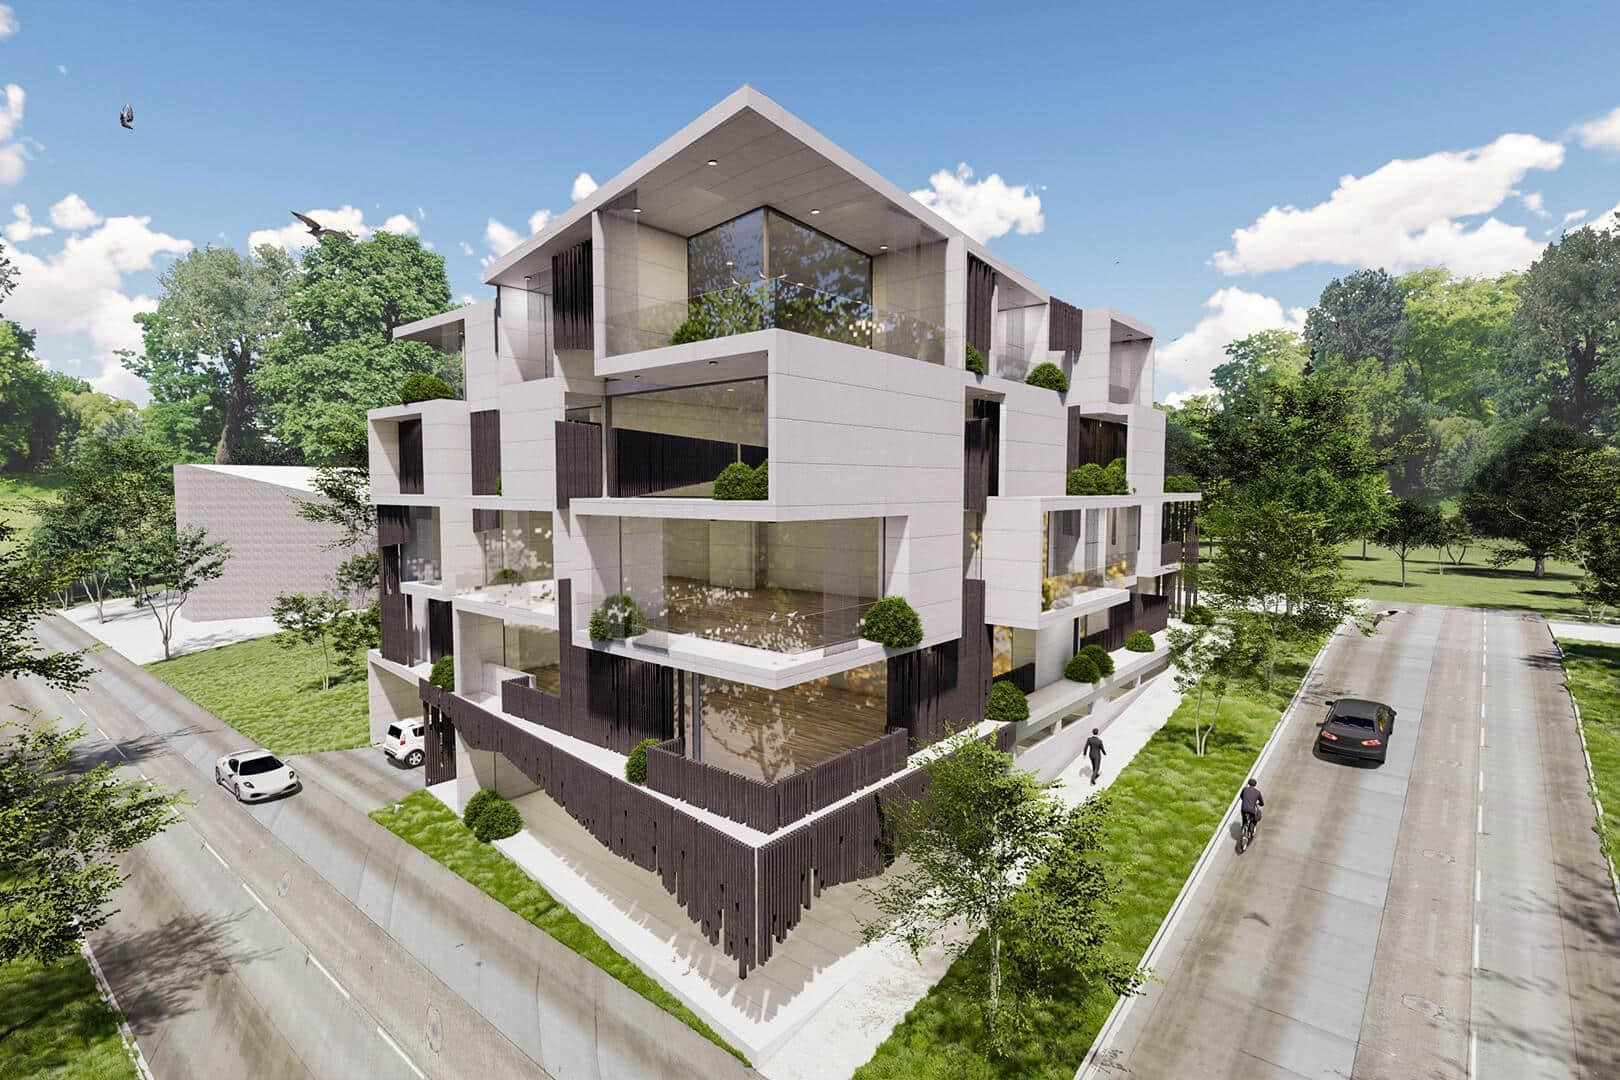 Ivanhoe Apartment - Melbourne Apartment designed by Sky Architect Studio